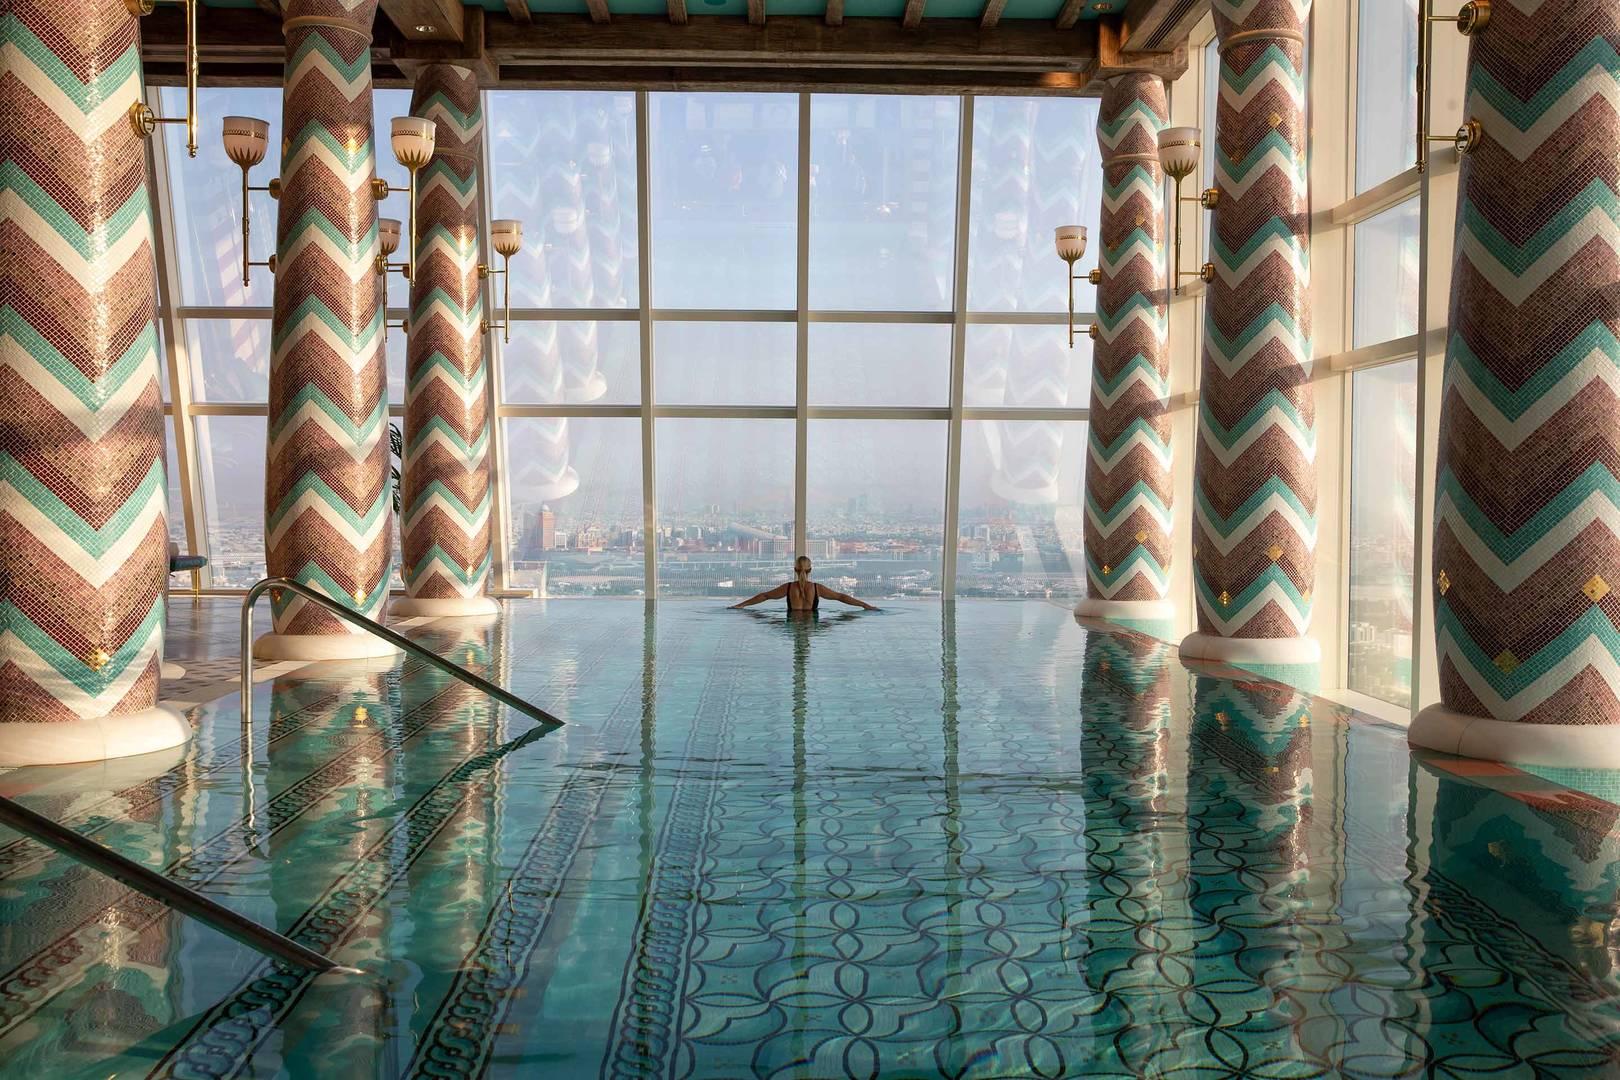 Jumeirah Bruj Al Arab Talise Spa pool_6-4